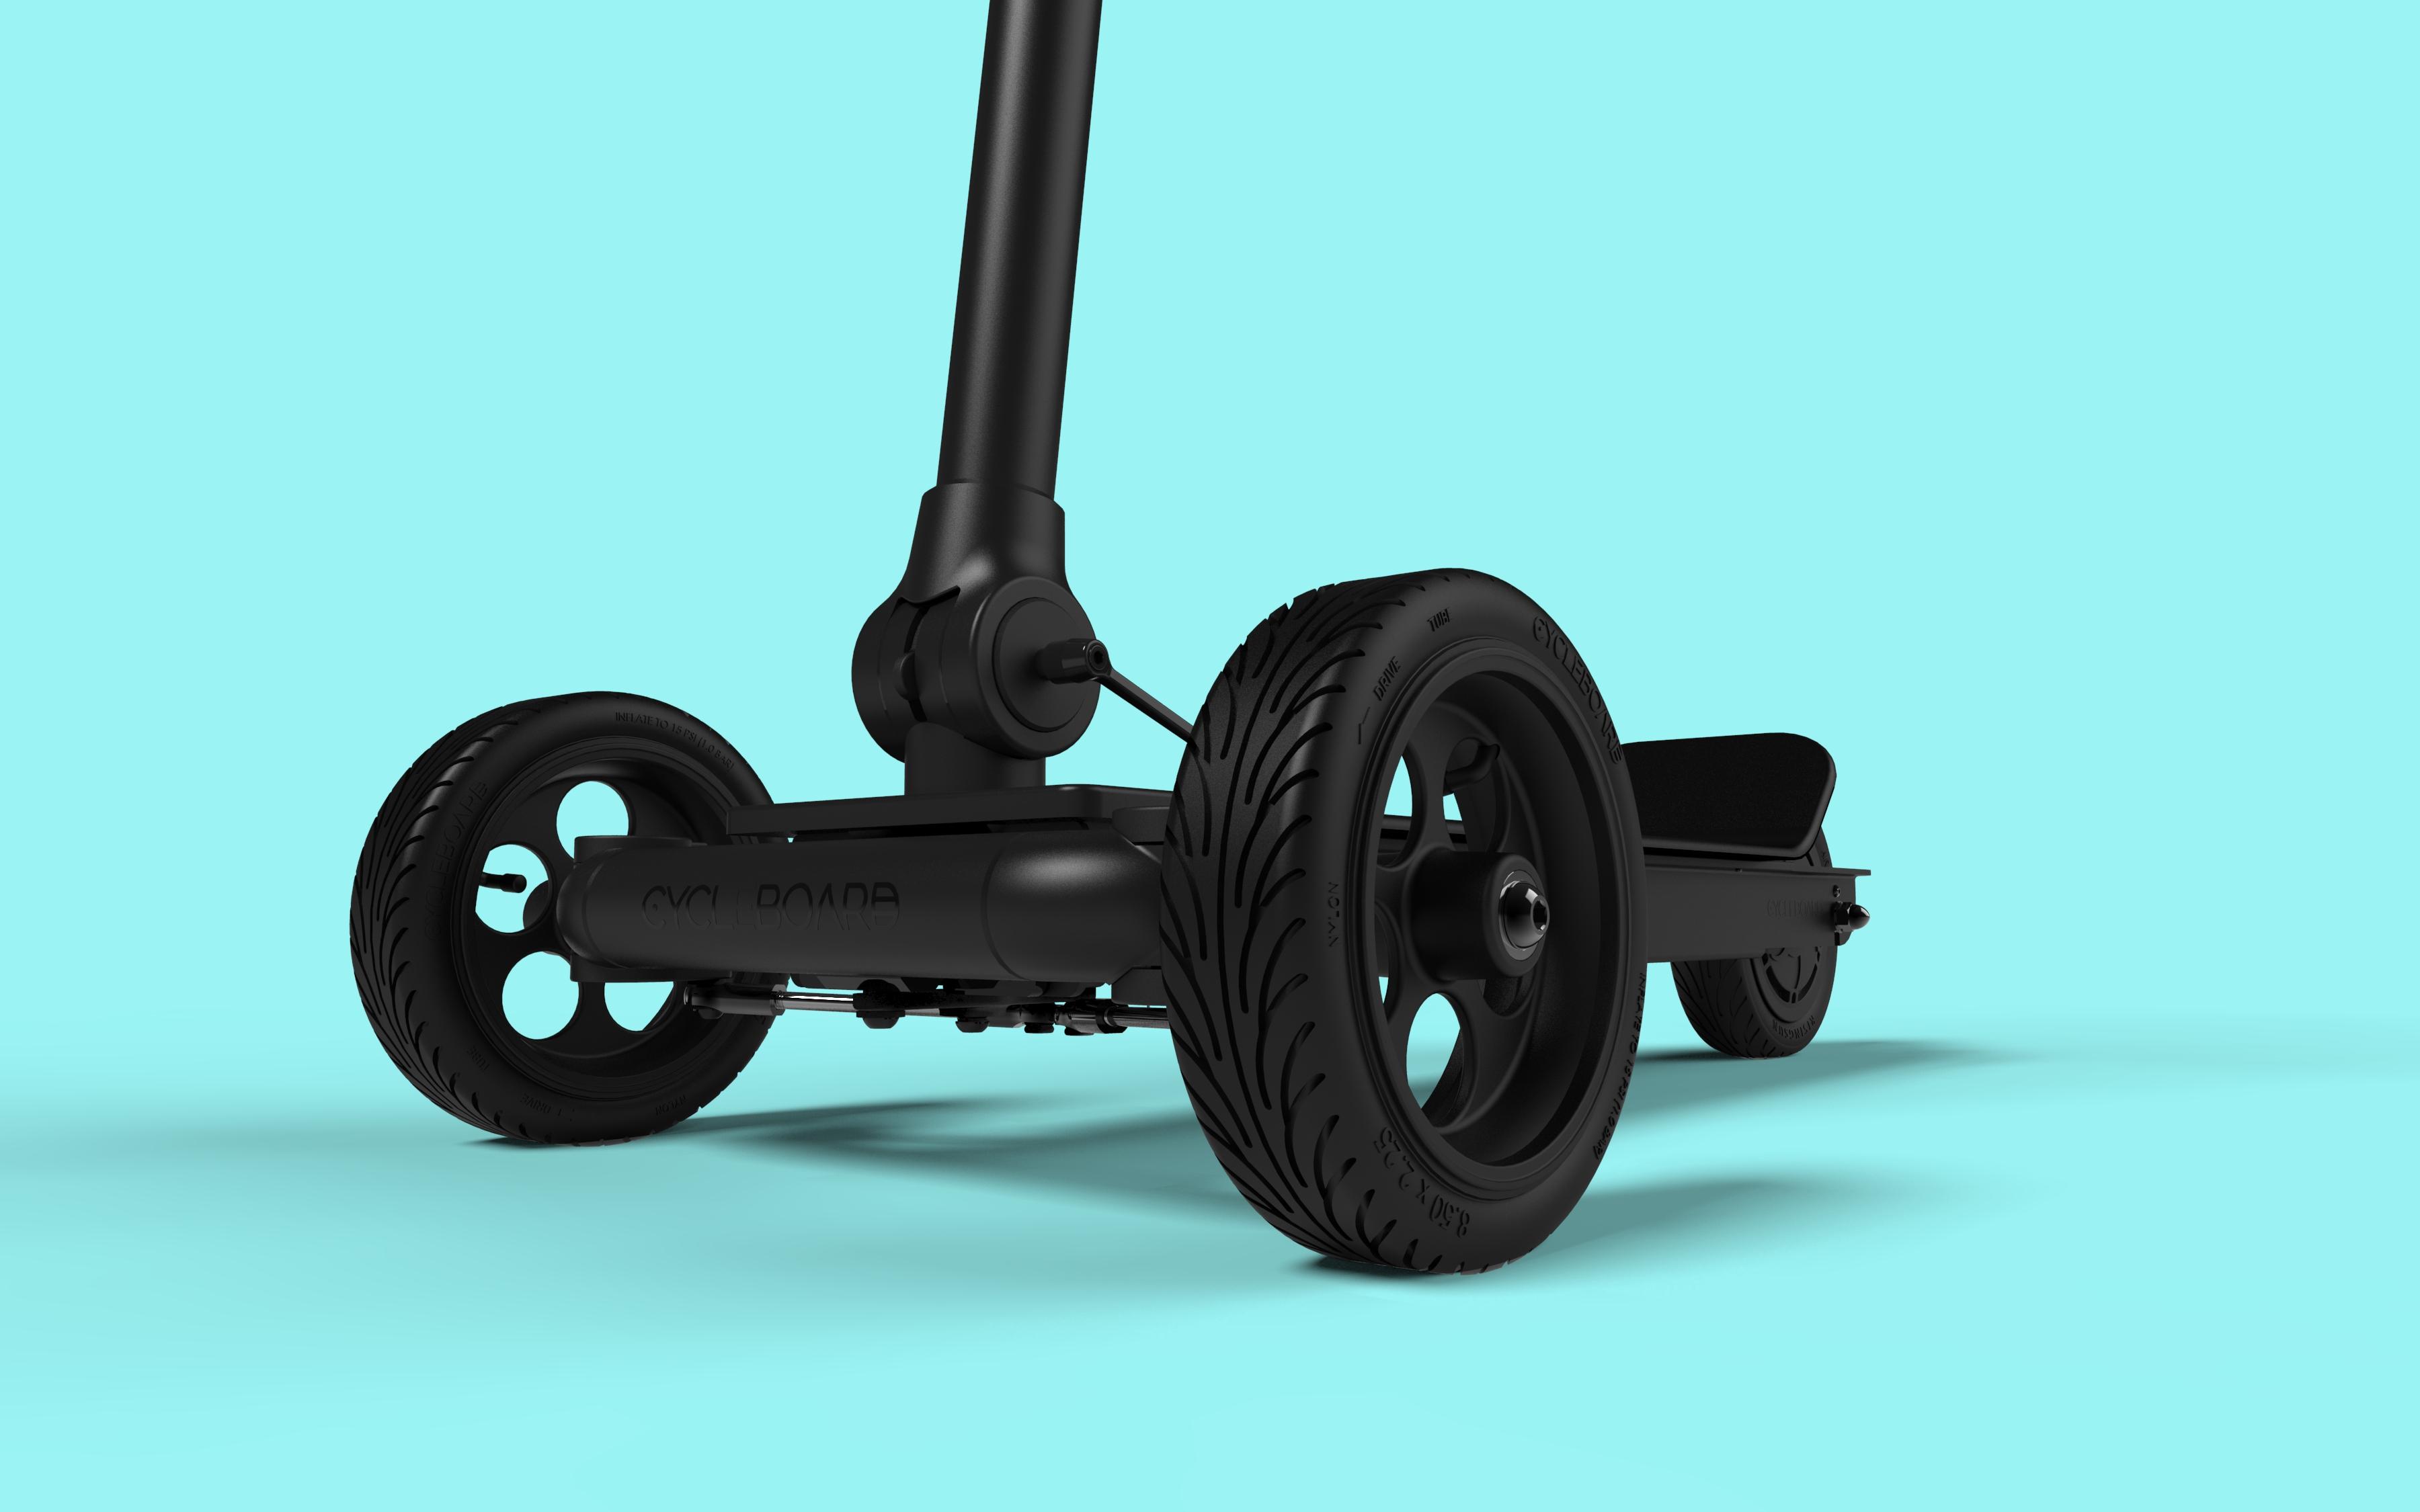 Cycleboard for portfolio.223